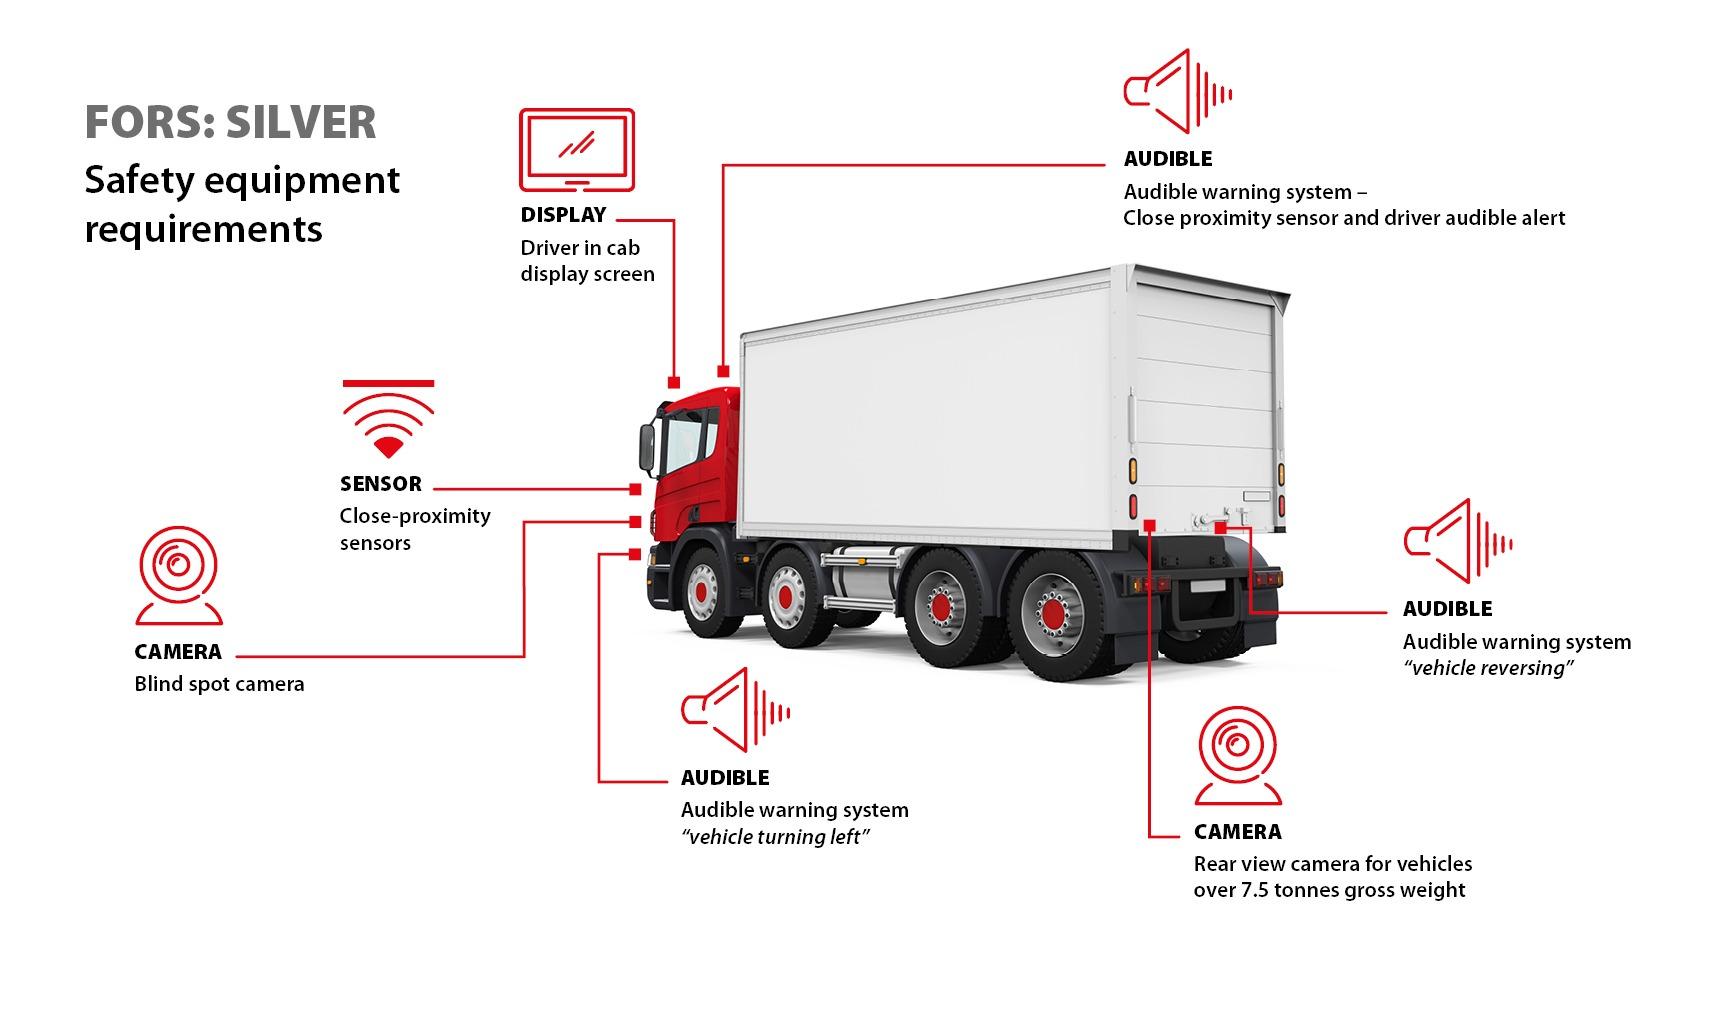 FORS/CLOCS Compliant Safe Vehicle - FORS Clocs Diagram SILVER WEB